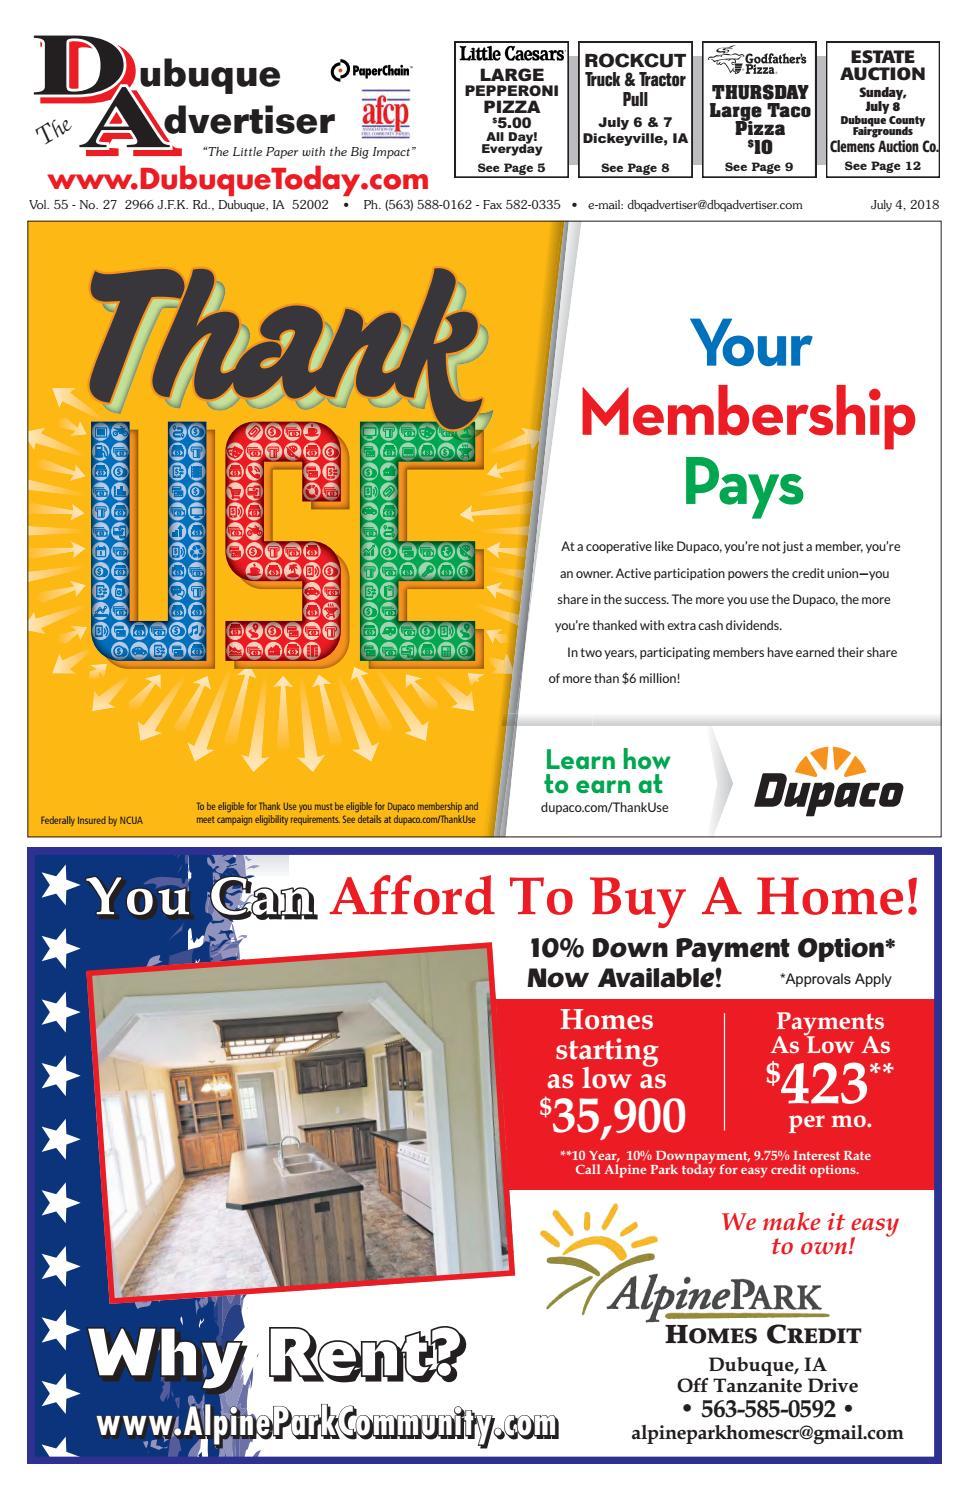 daf61e73873e47 The Dubuque Advertiser